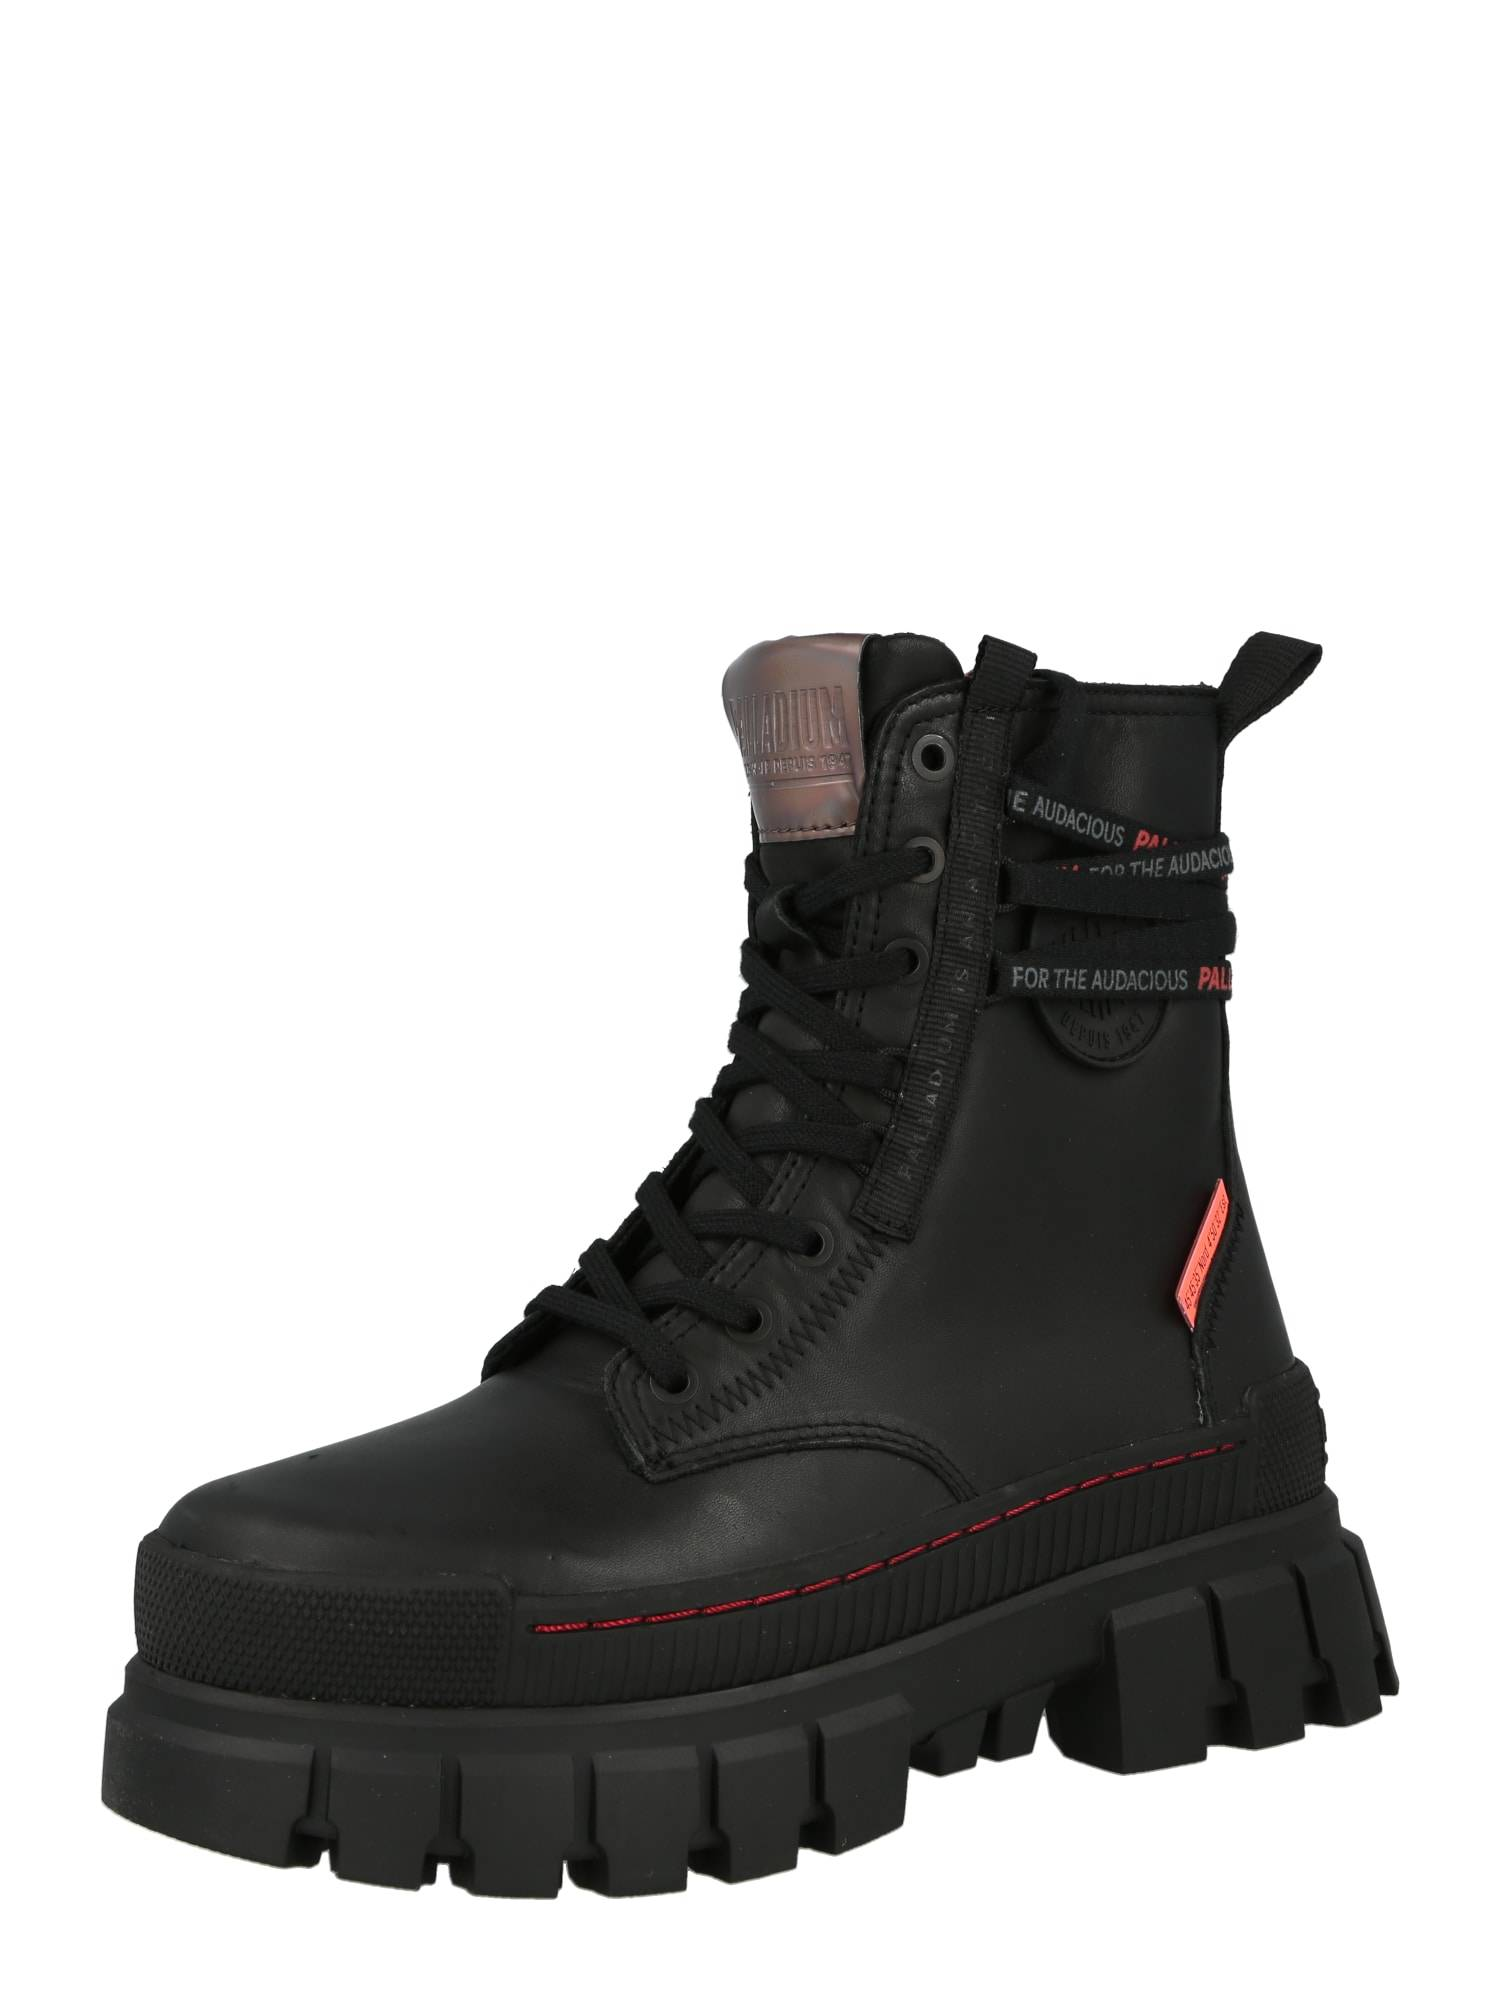 Palladium Boots 'REVOLT'  - Noir - Taille: 41 - female